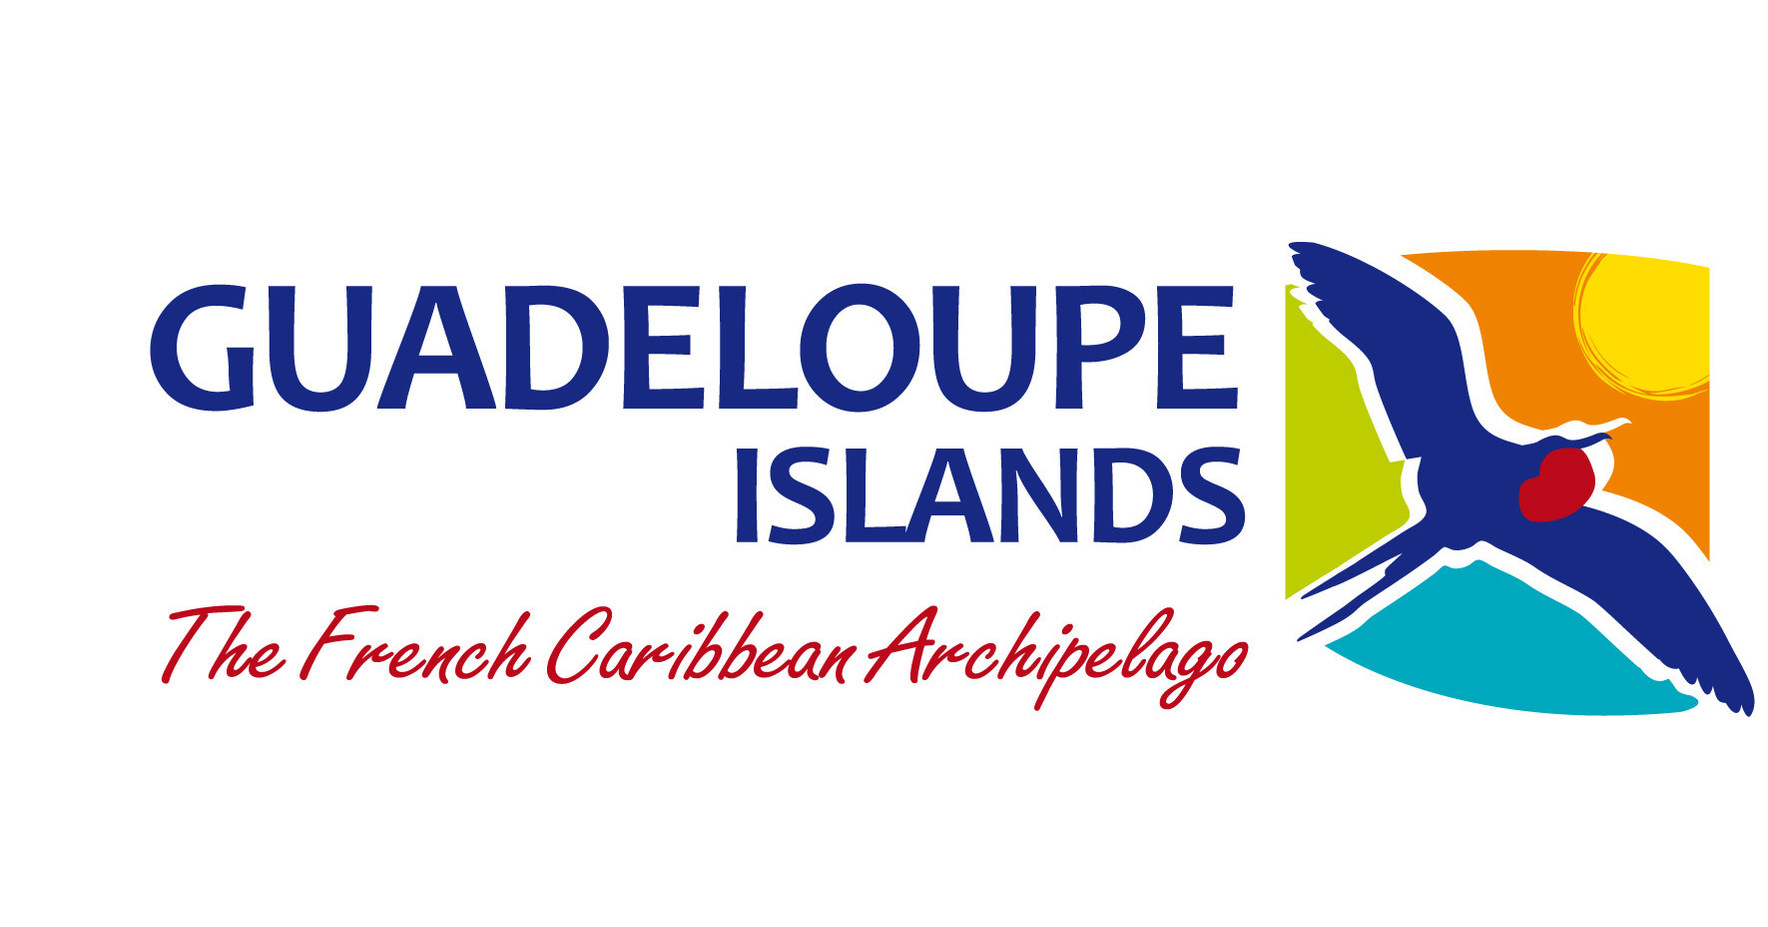 Guadeloupe Islands Tourist Board Logo jpg?p=facebook.